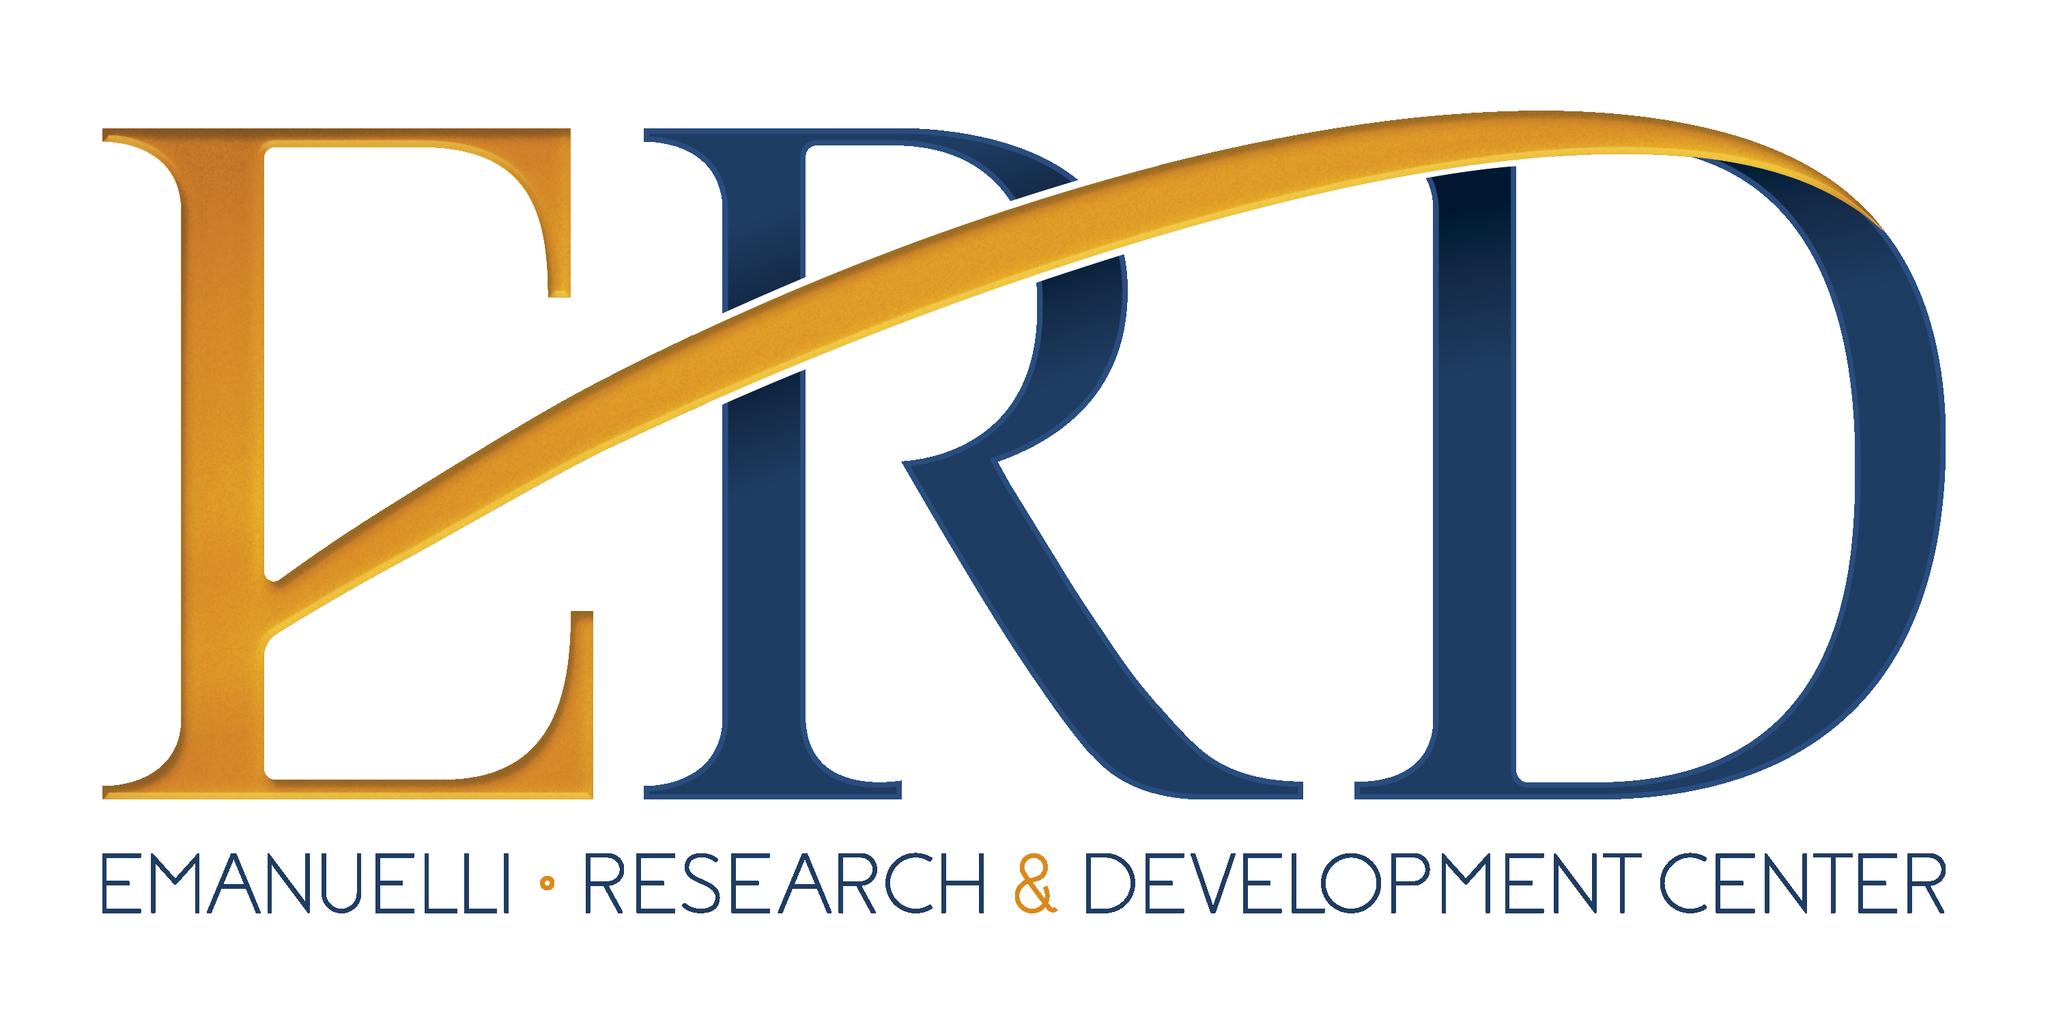 Emanuelli Research & Development